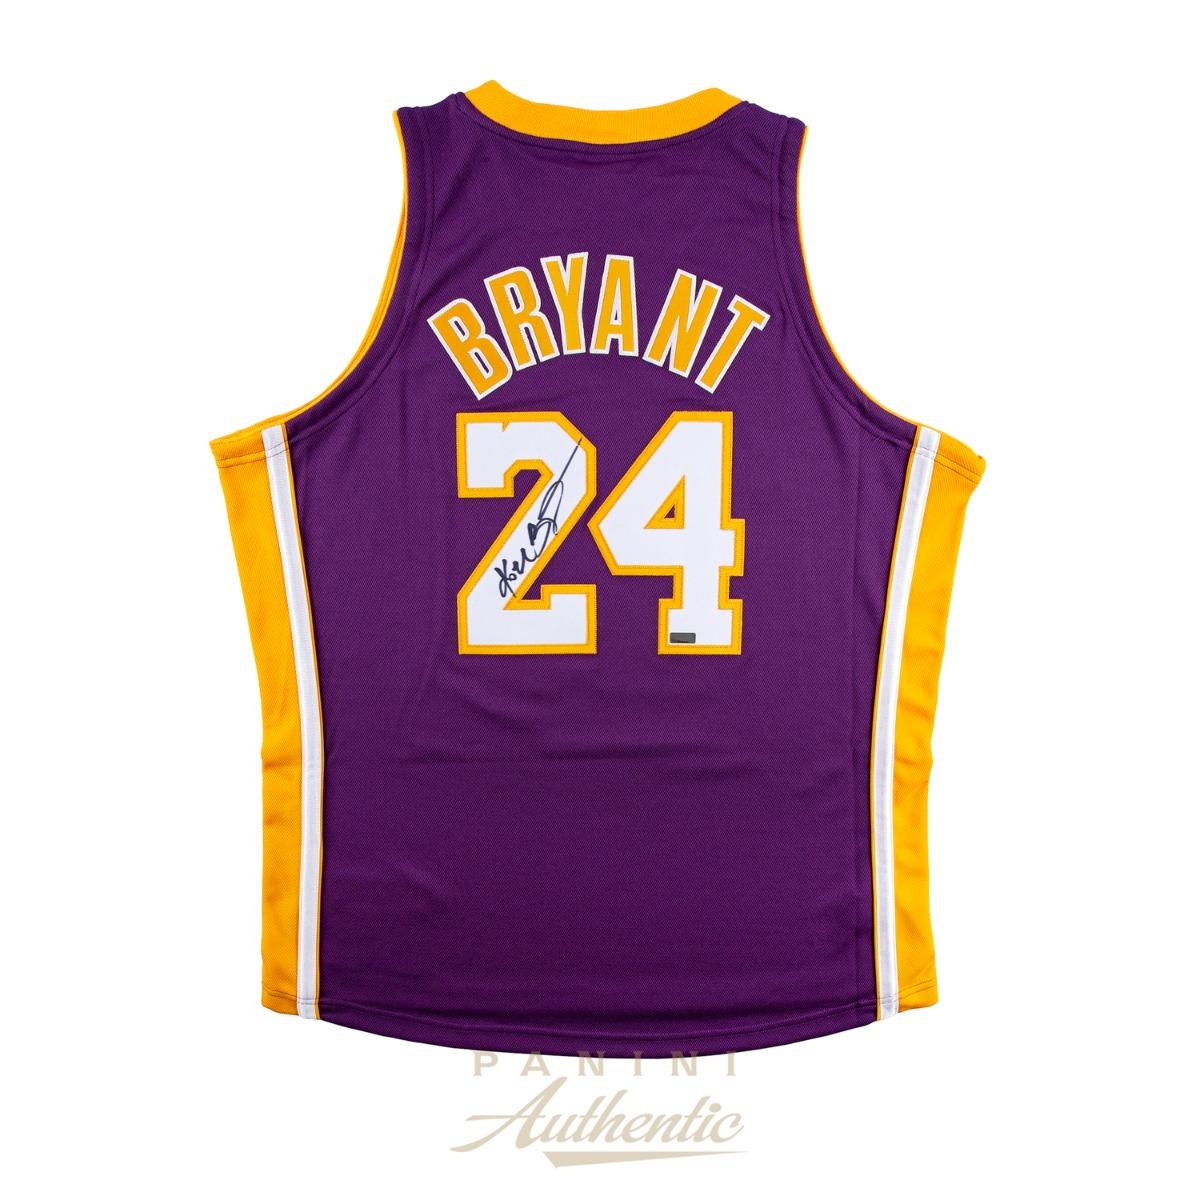 promo code 18f16 2d731 Kobe Bryant Autographed Mitchell & Ness 2006-2007 Purple #24 ...